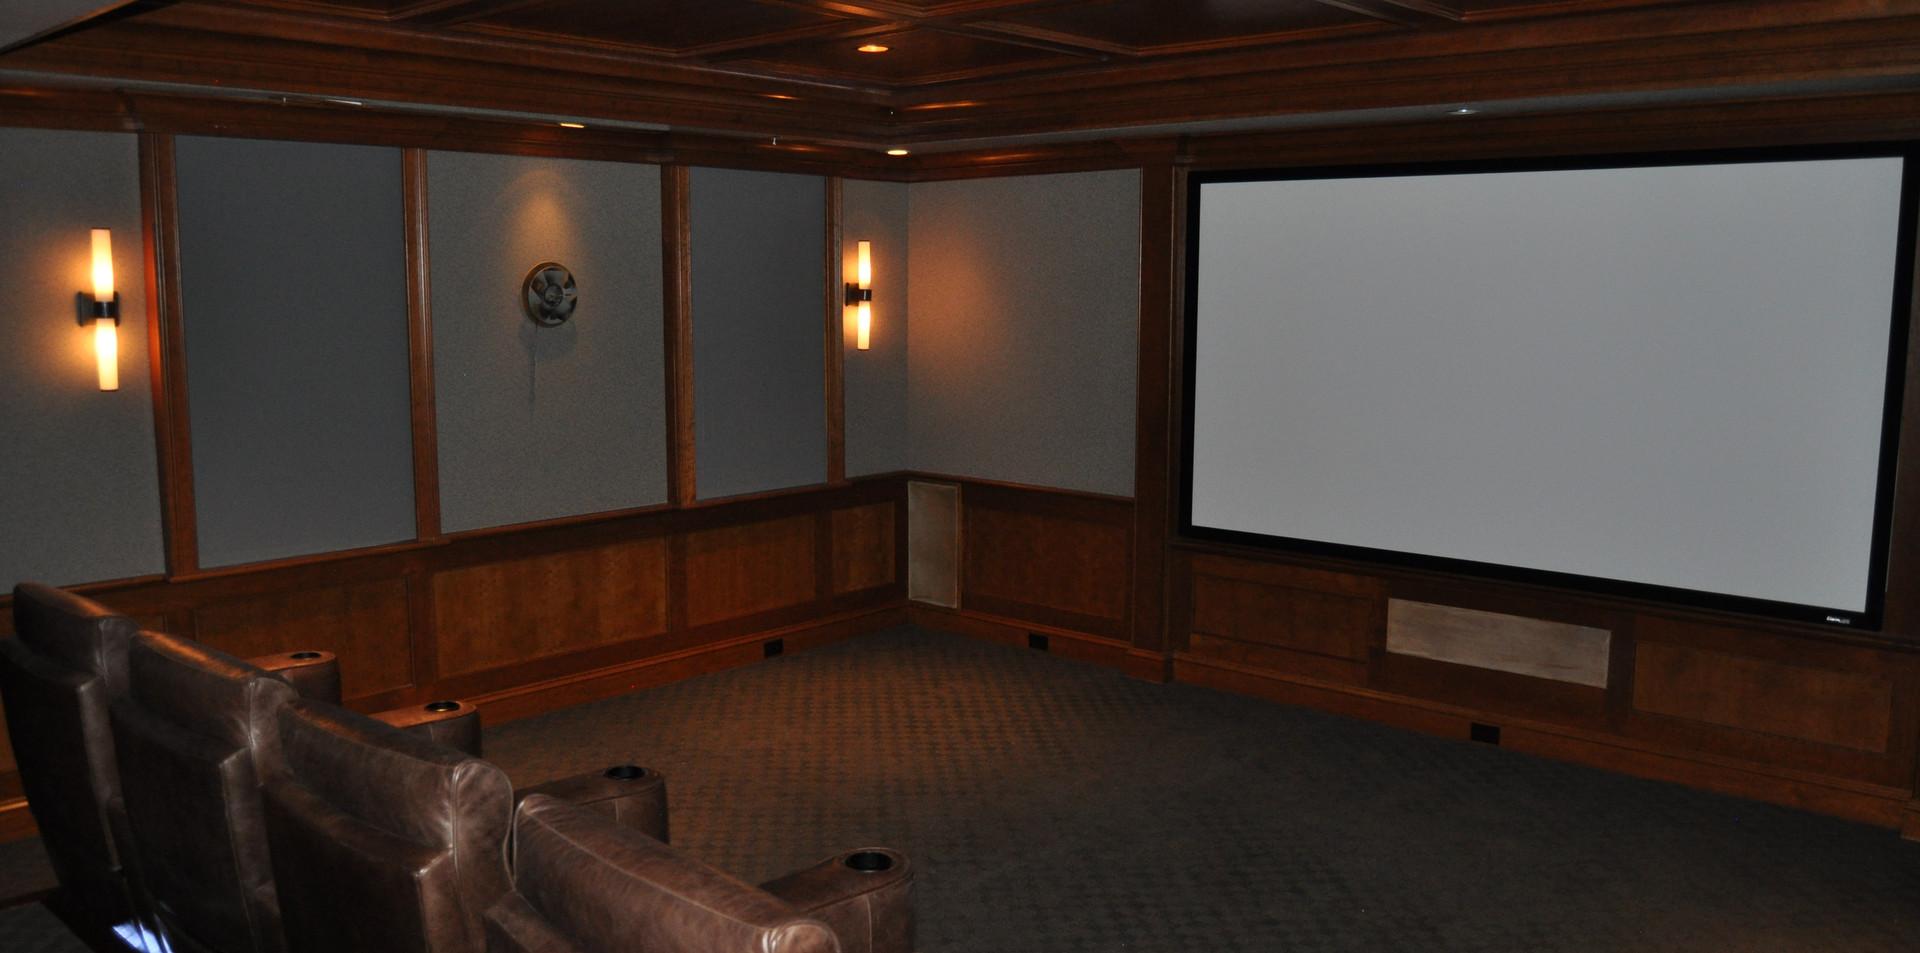 Showcase Home Theater